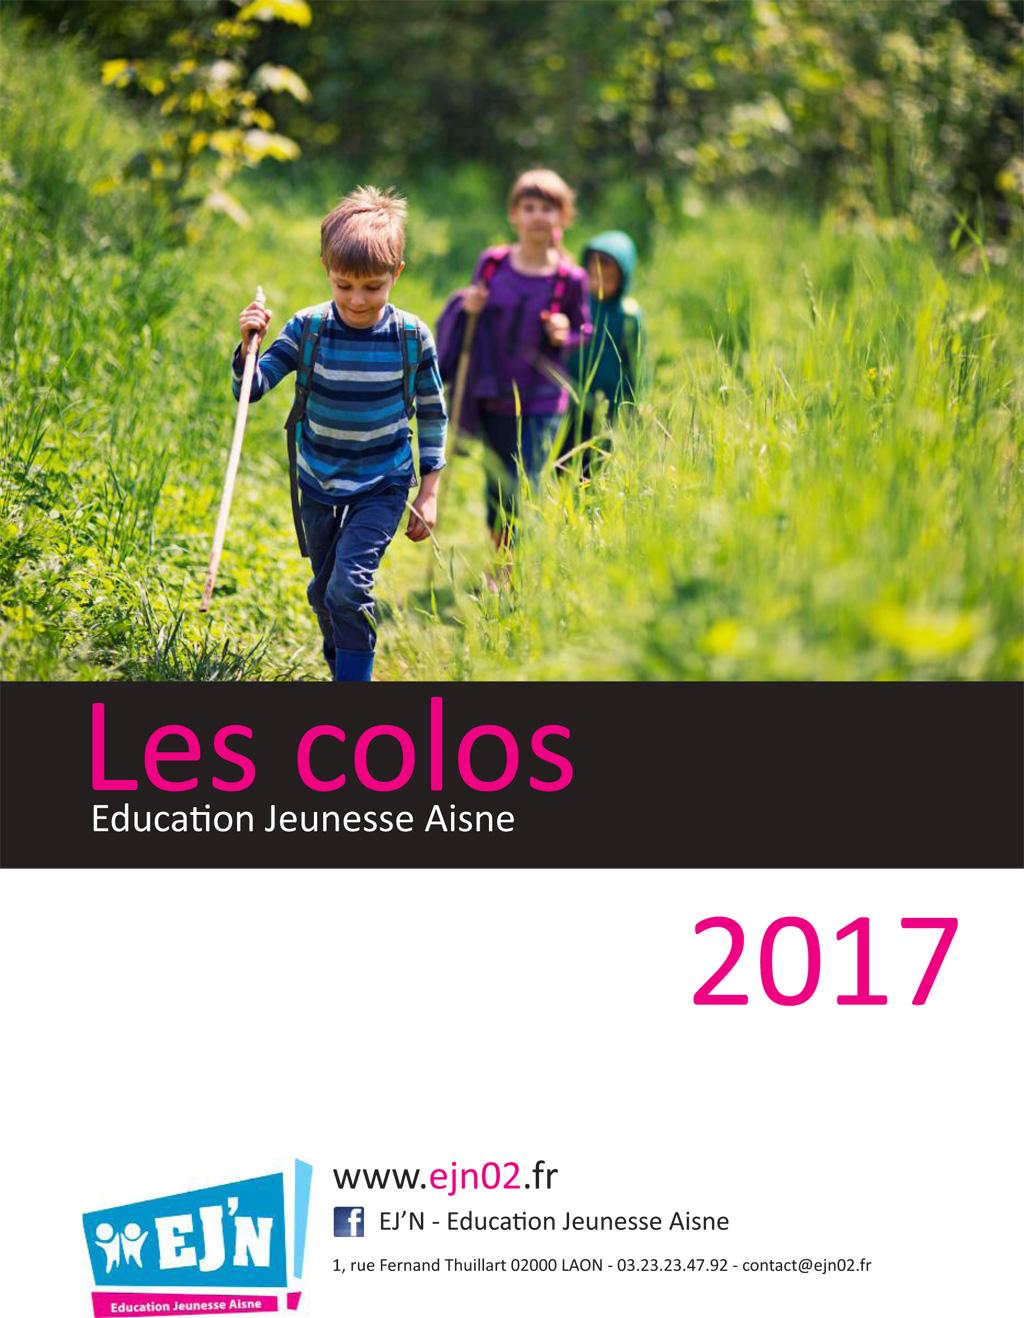 Les colos-ejn02